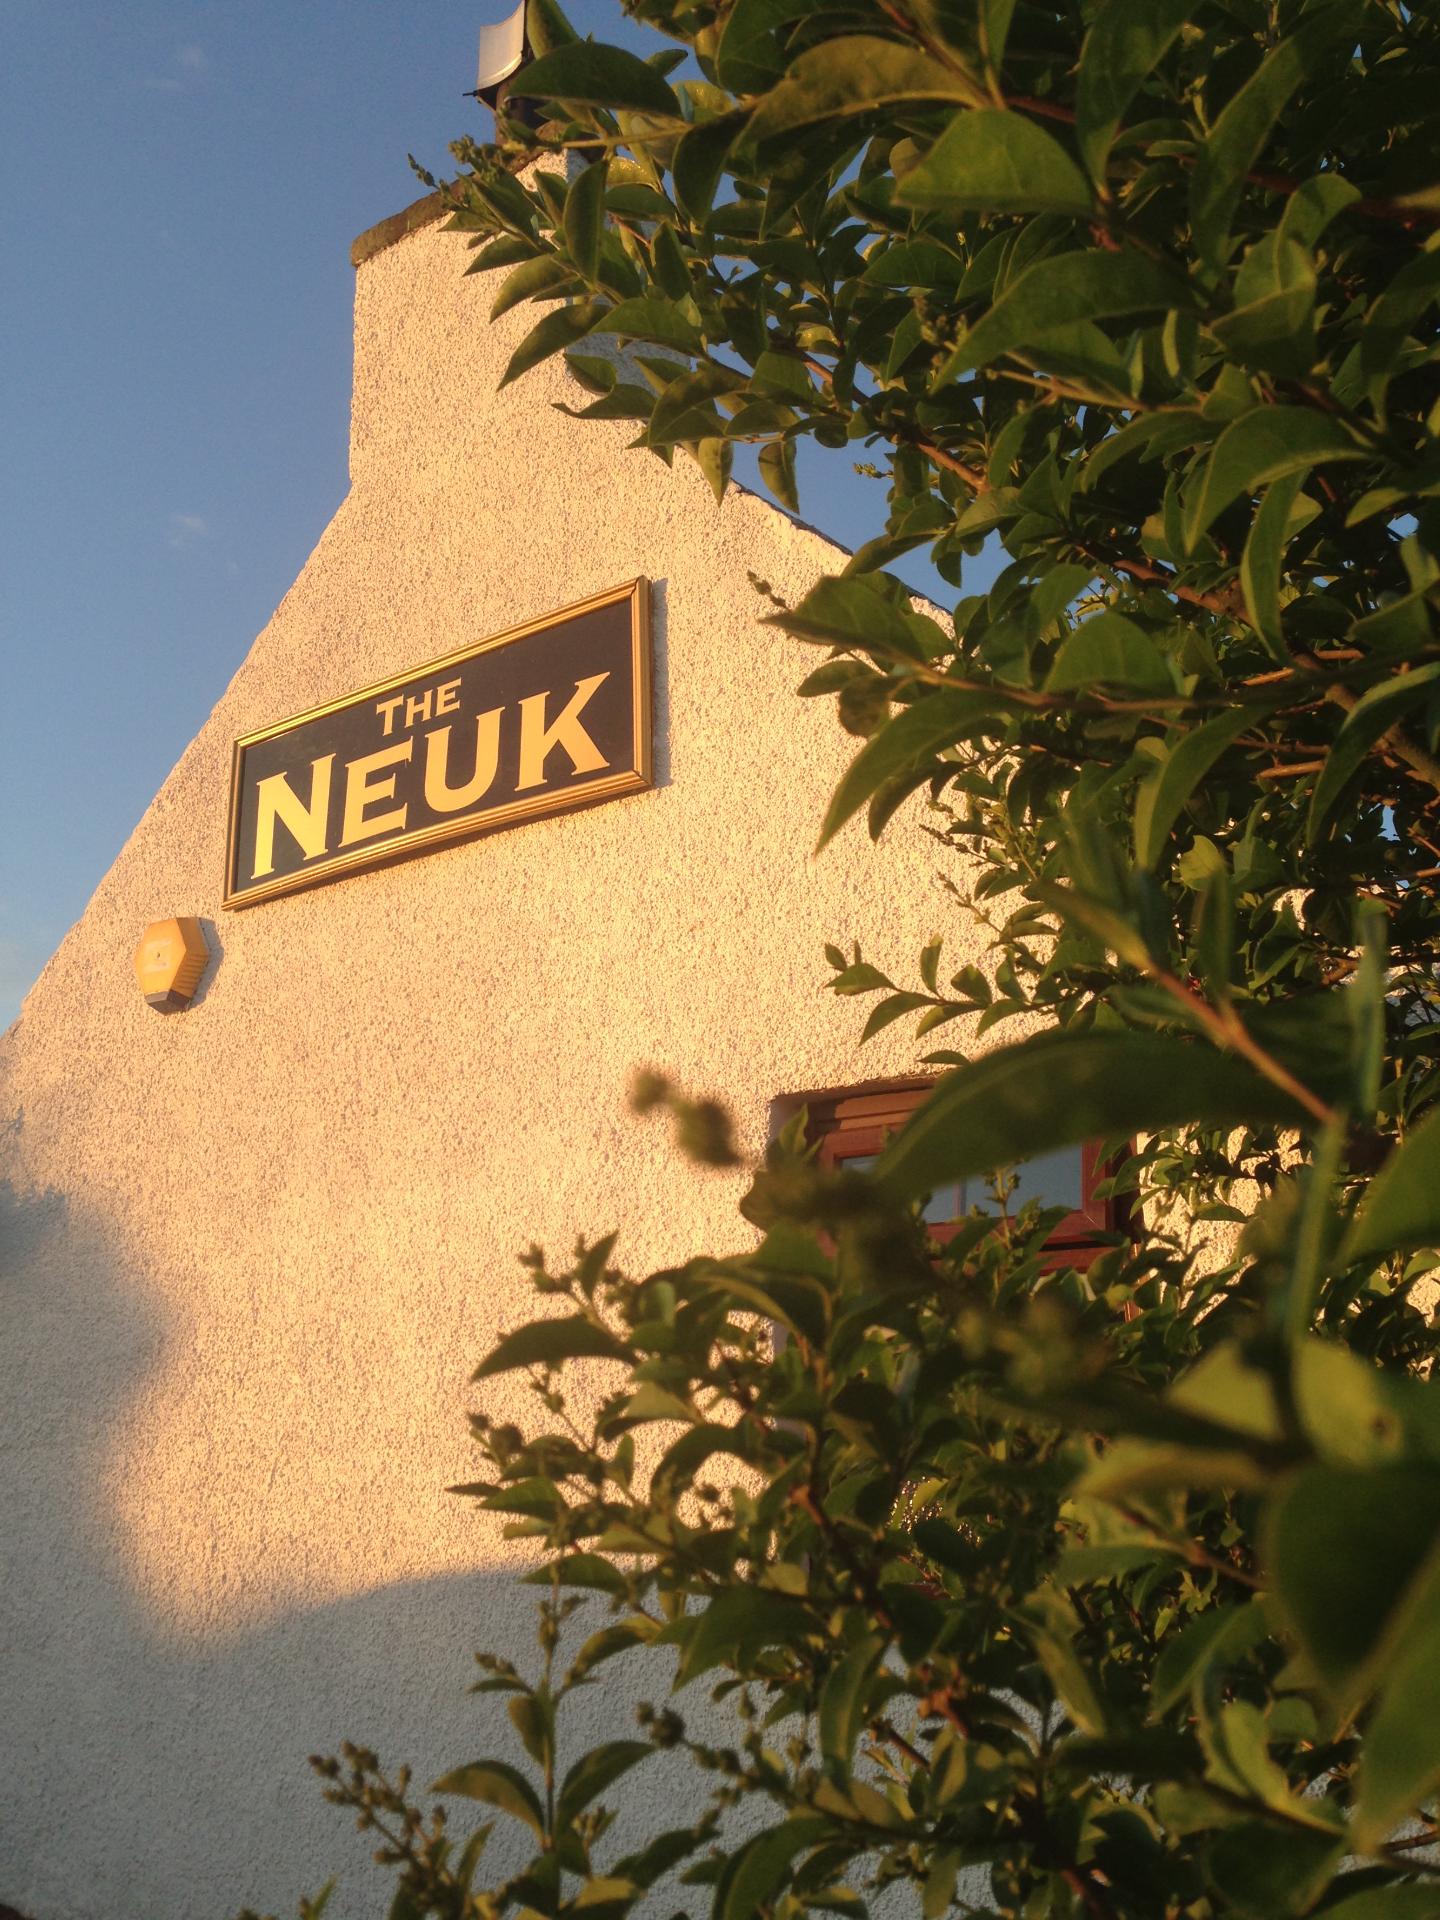 The Neuk